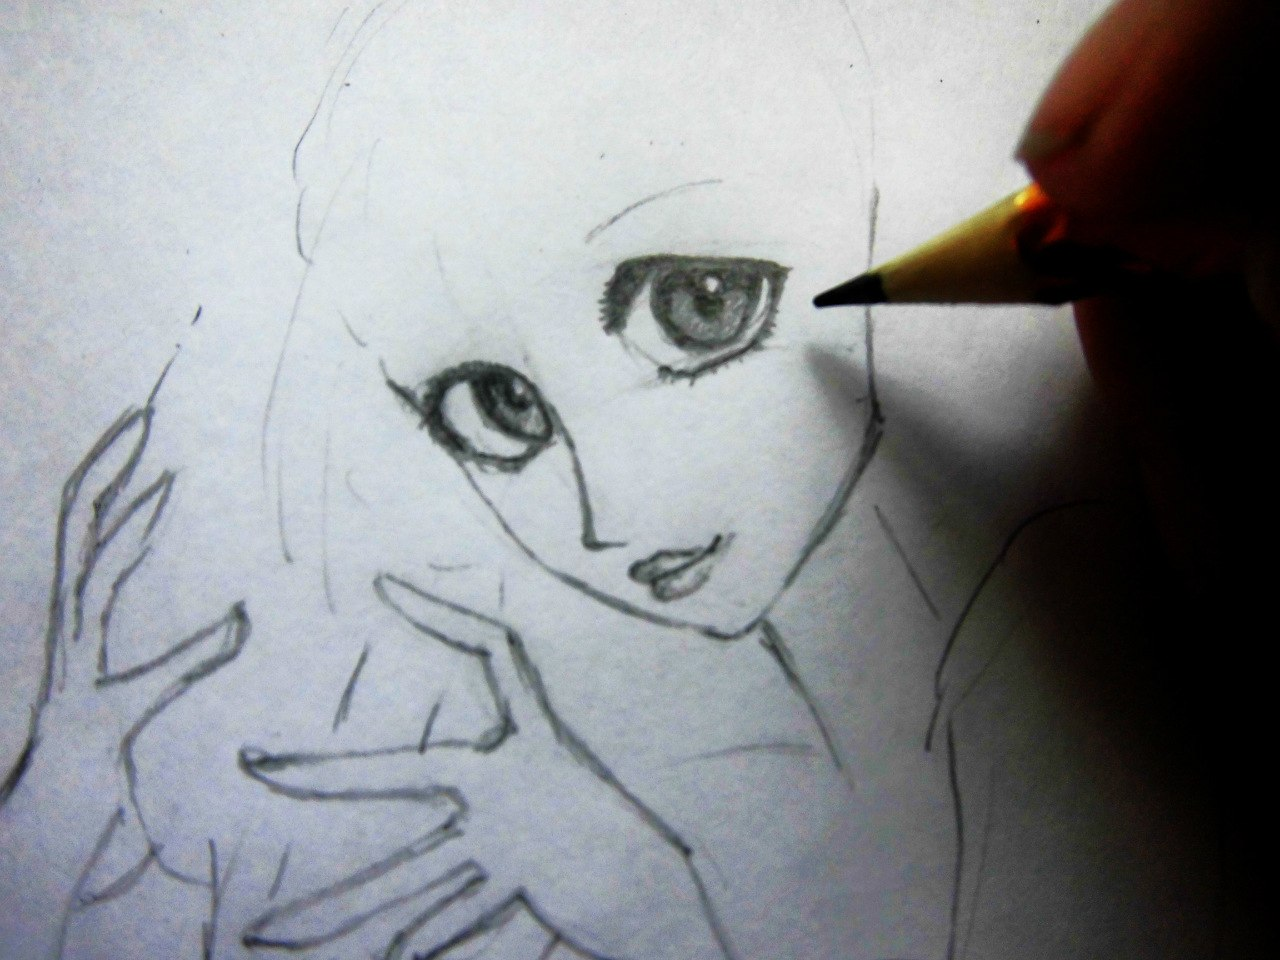 Рисуем милую Ариэль  на бумаге - шаг 5